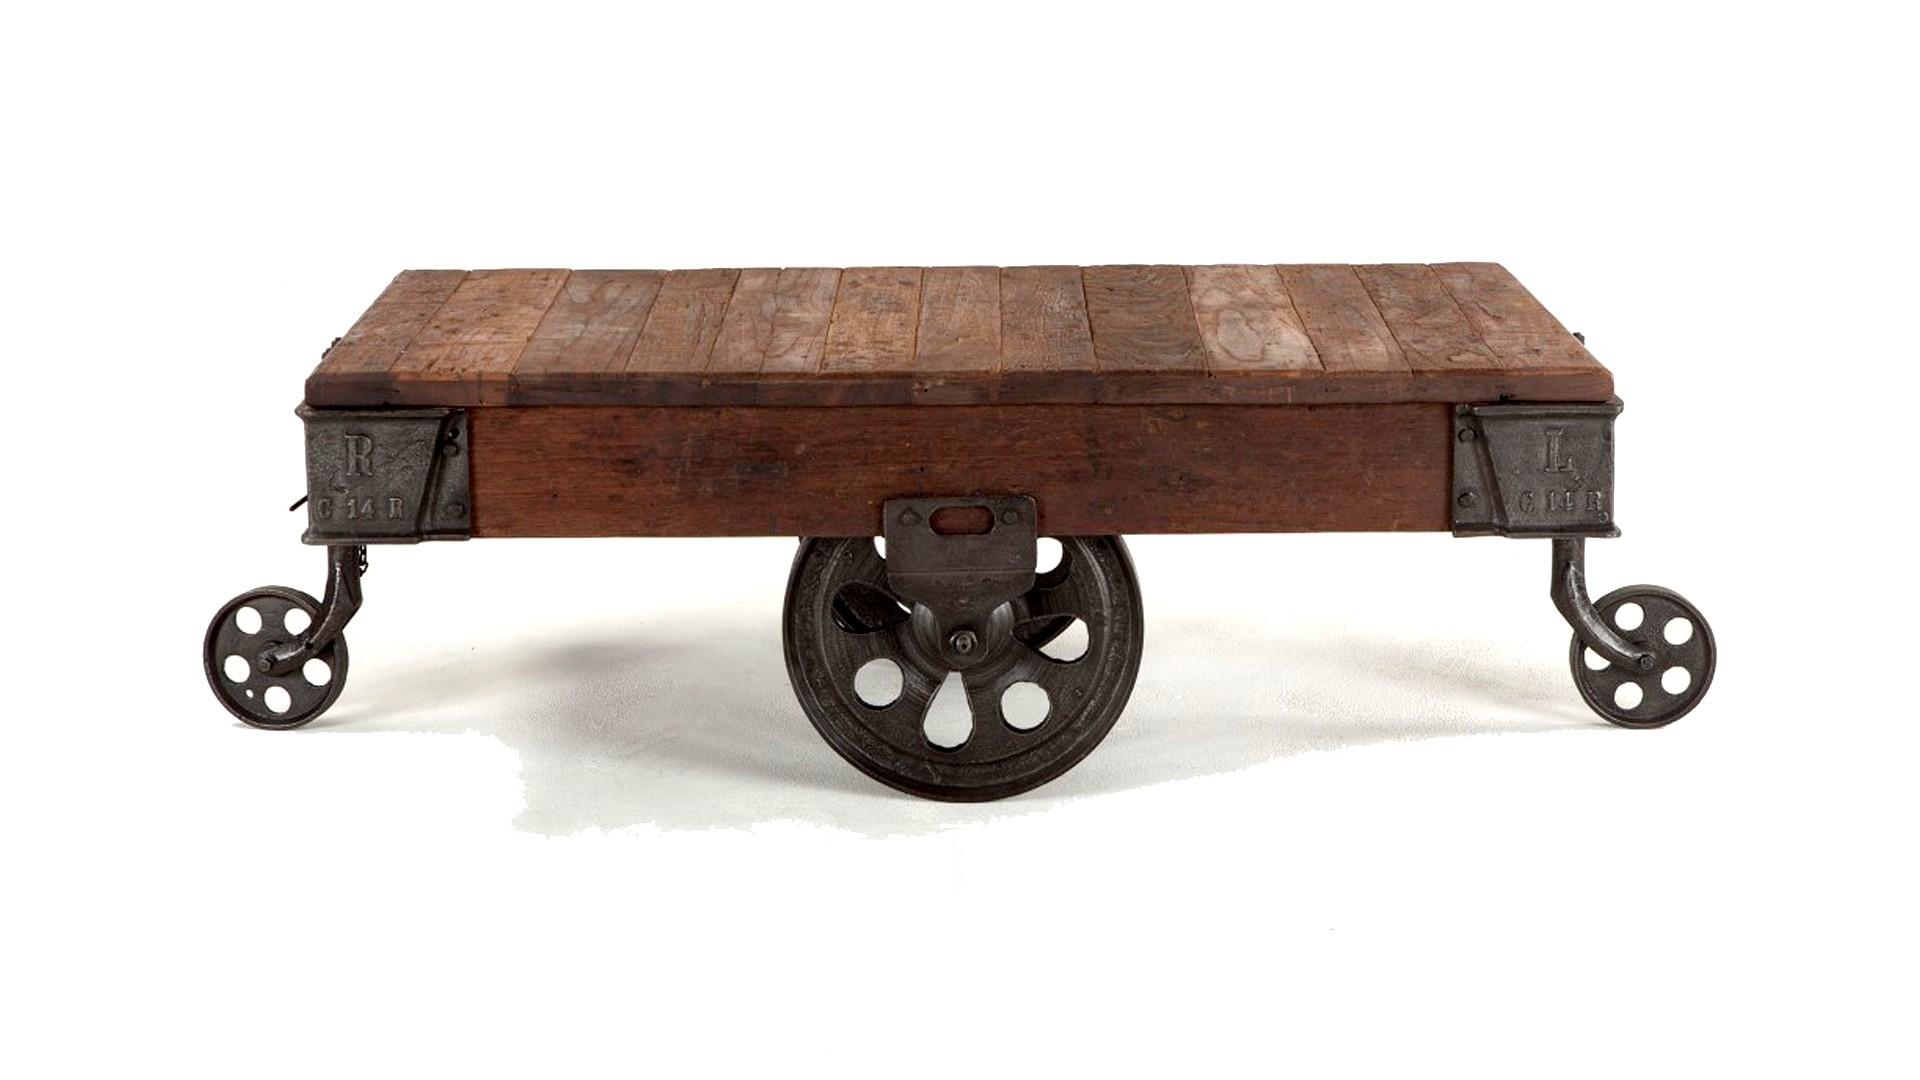 Industrial Coffee Table Wheels Barnxo Handmade Furniture Barnwood in size 1920 X 1080